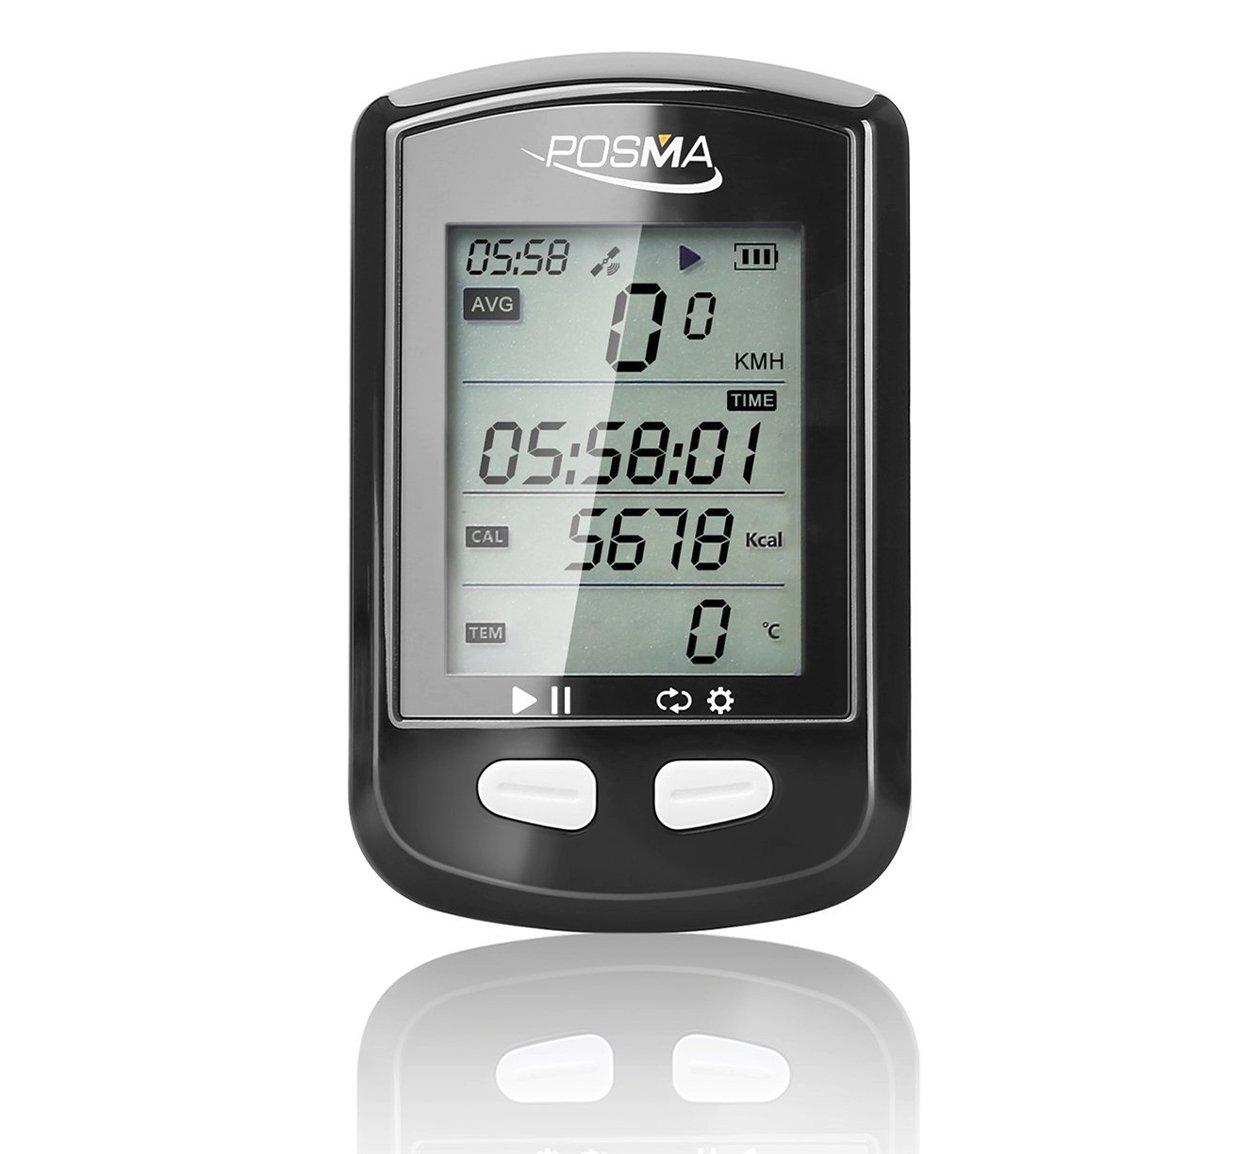 LYM POSMA DB2 GPS Cycling GPS Computer Speedometer Odometer Altimeter Calories, Wireless Cycle Bike Computer by LYM